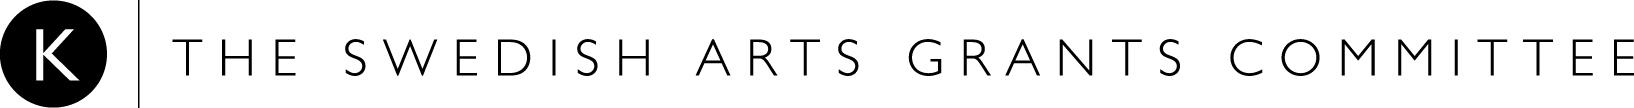 KON_short_swed_arts_grants_committee_stor_150dpi.jpg